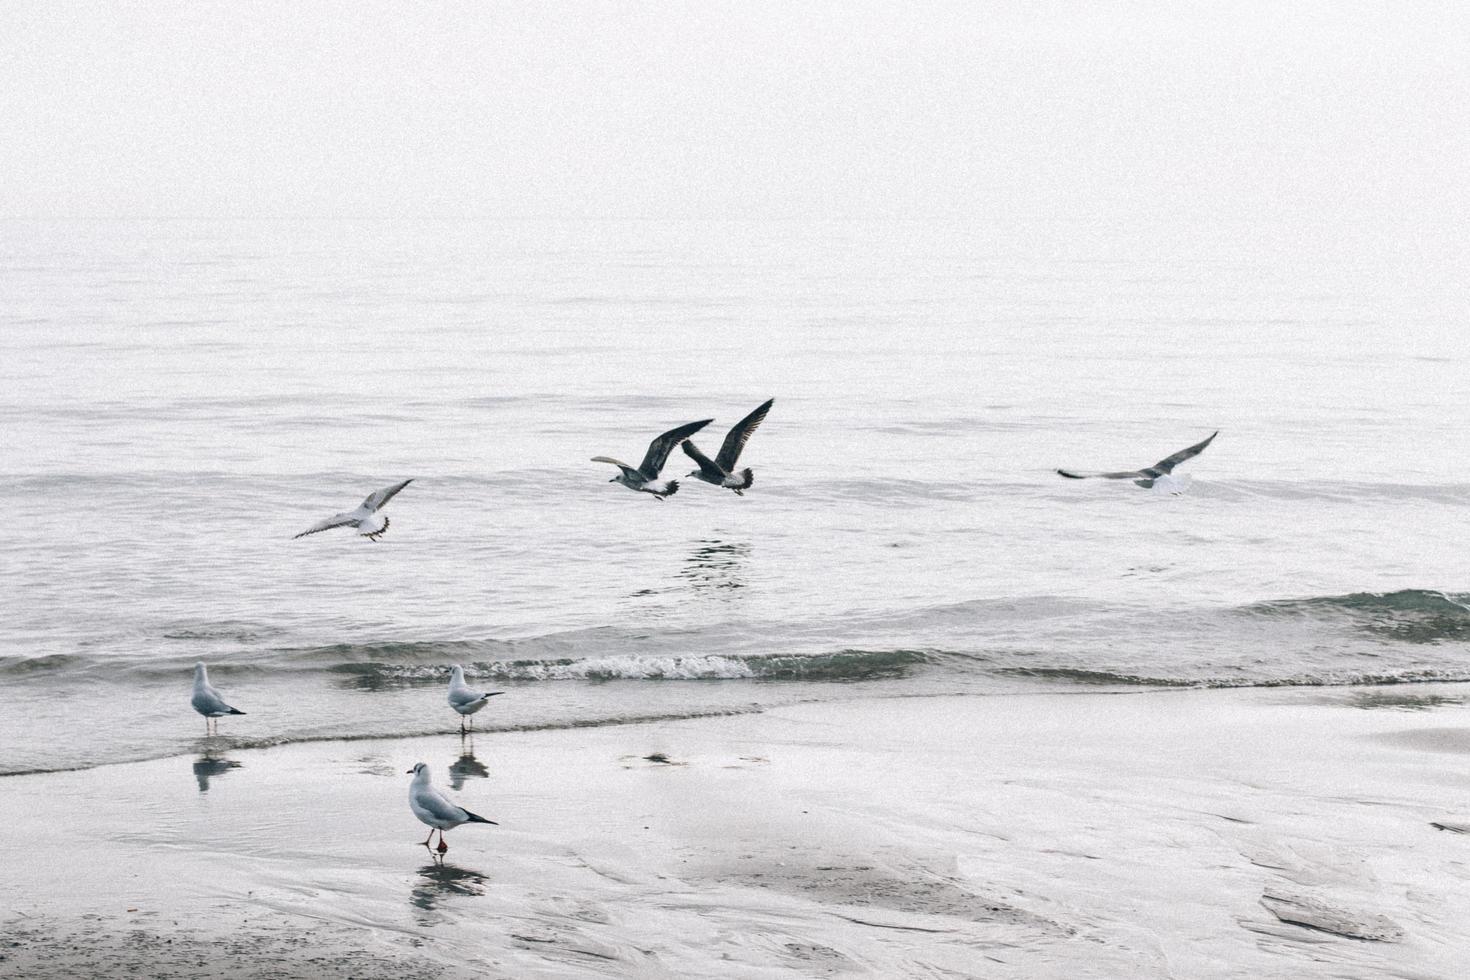 Seagulls fly above coastline photo